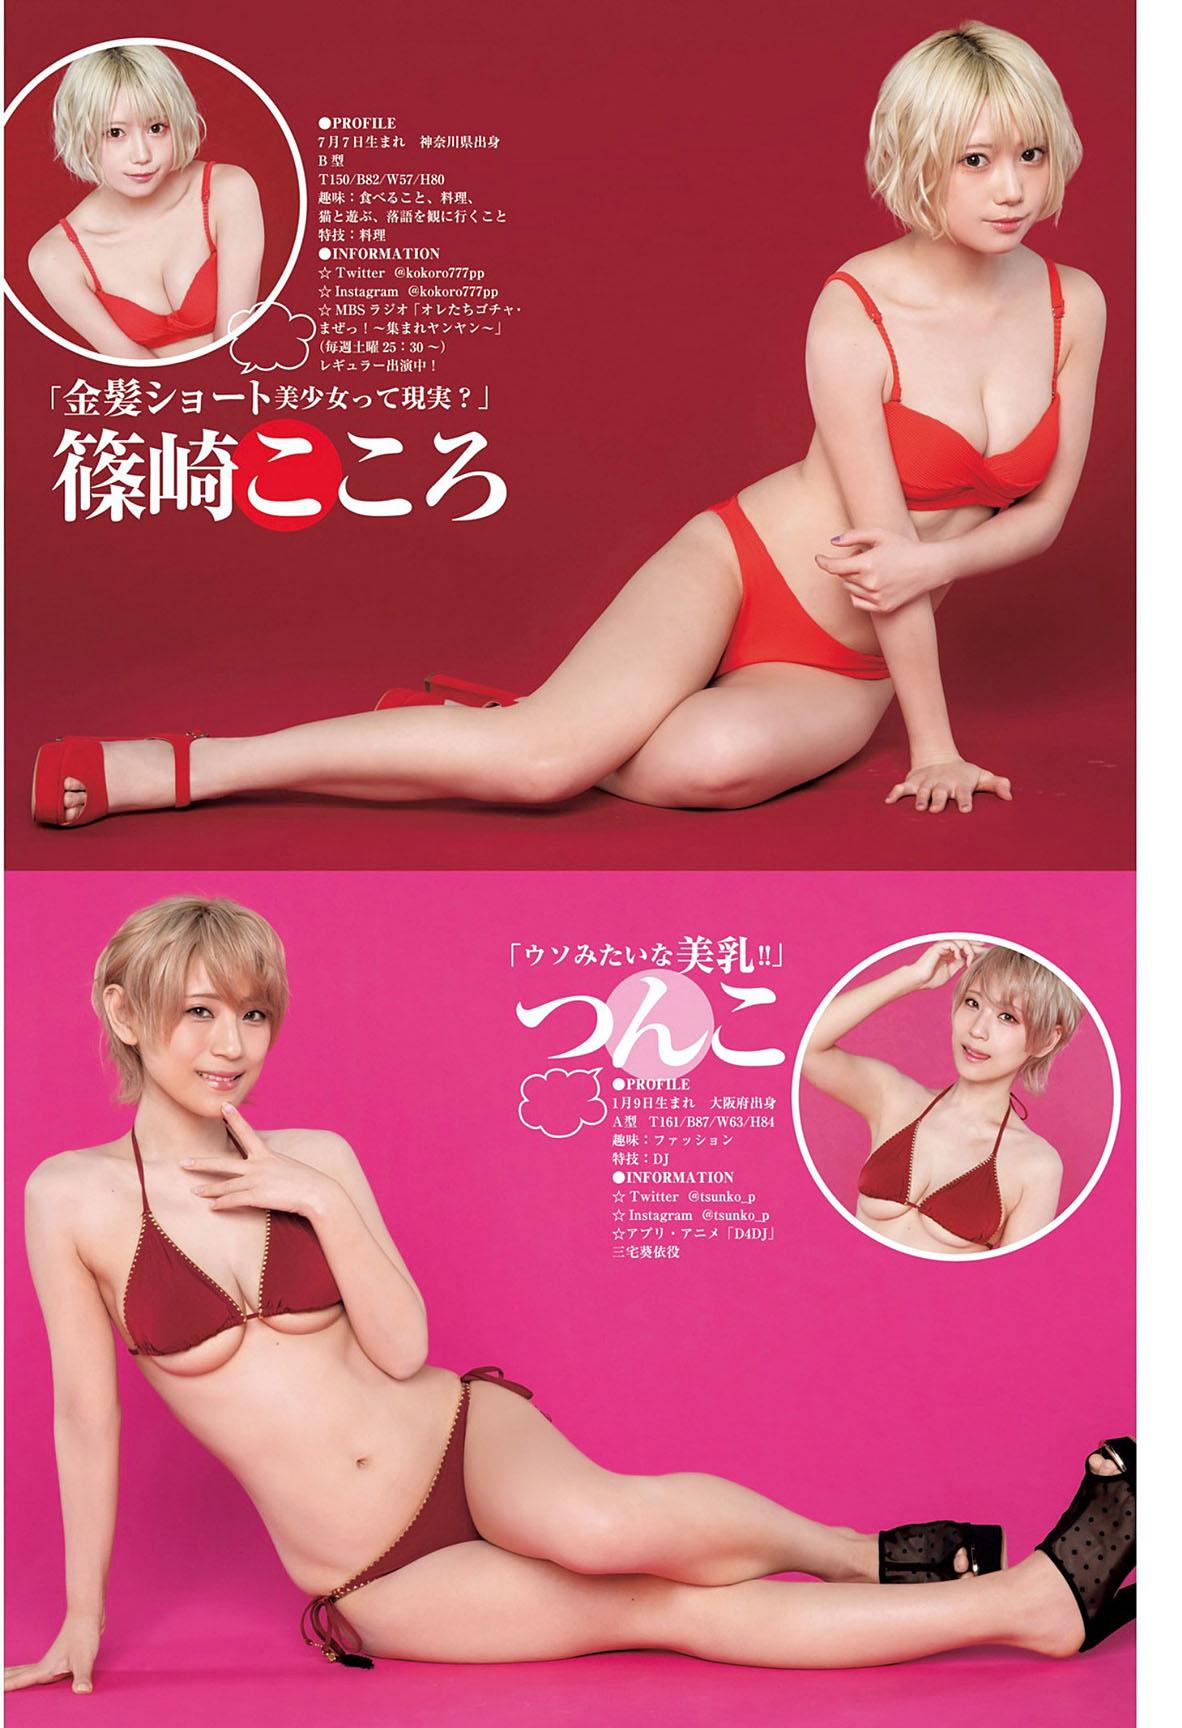 Enako Young Jump 210325 12.jpg